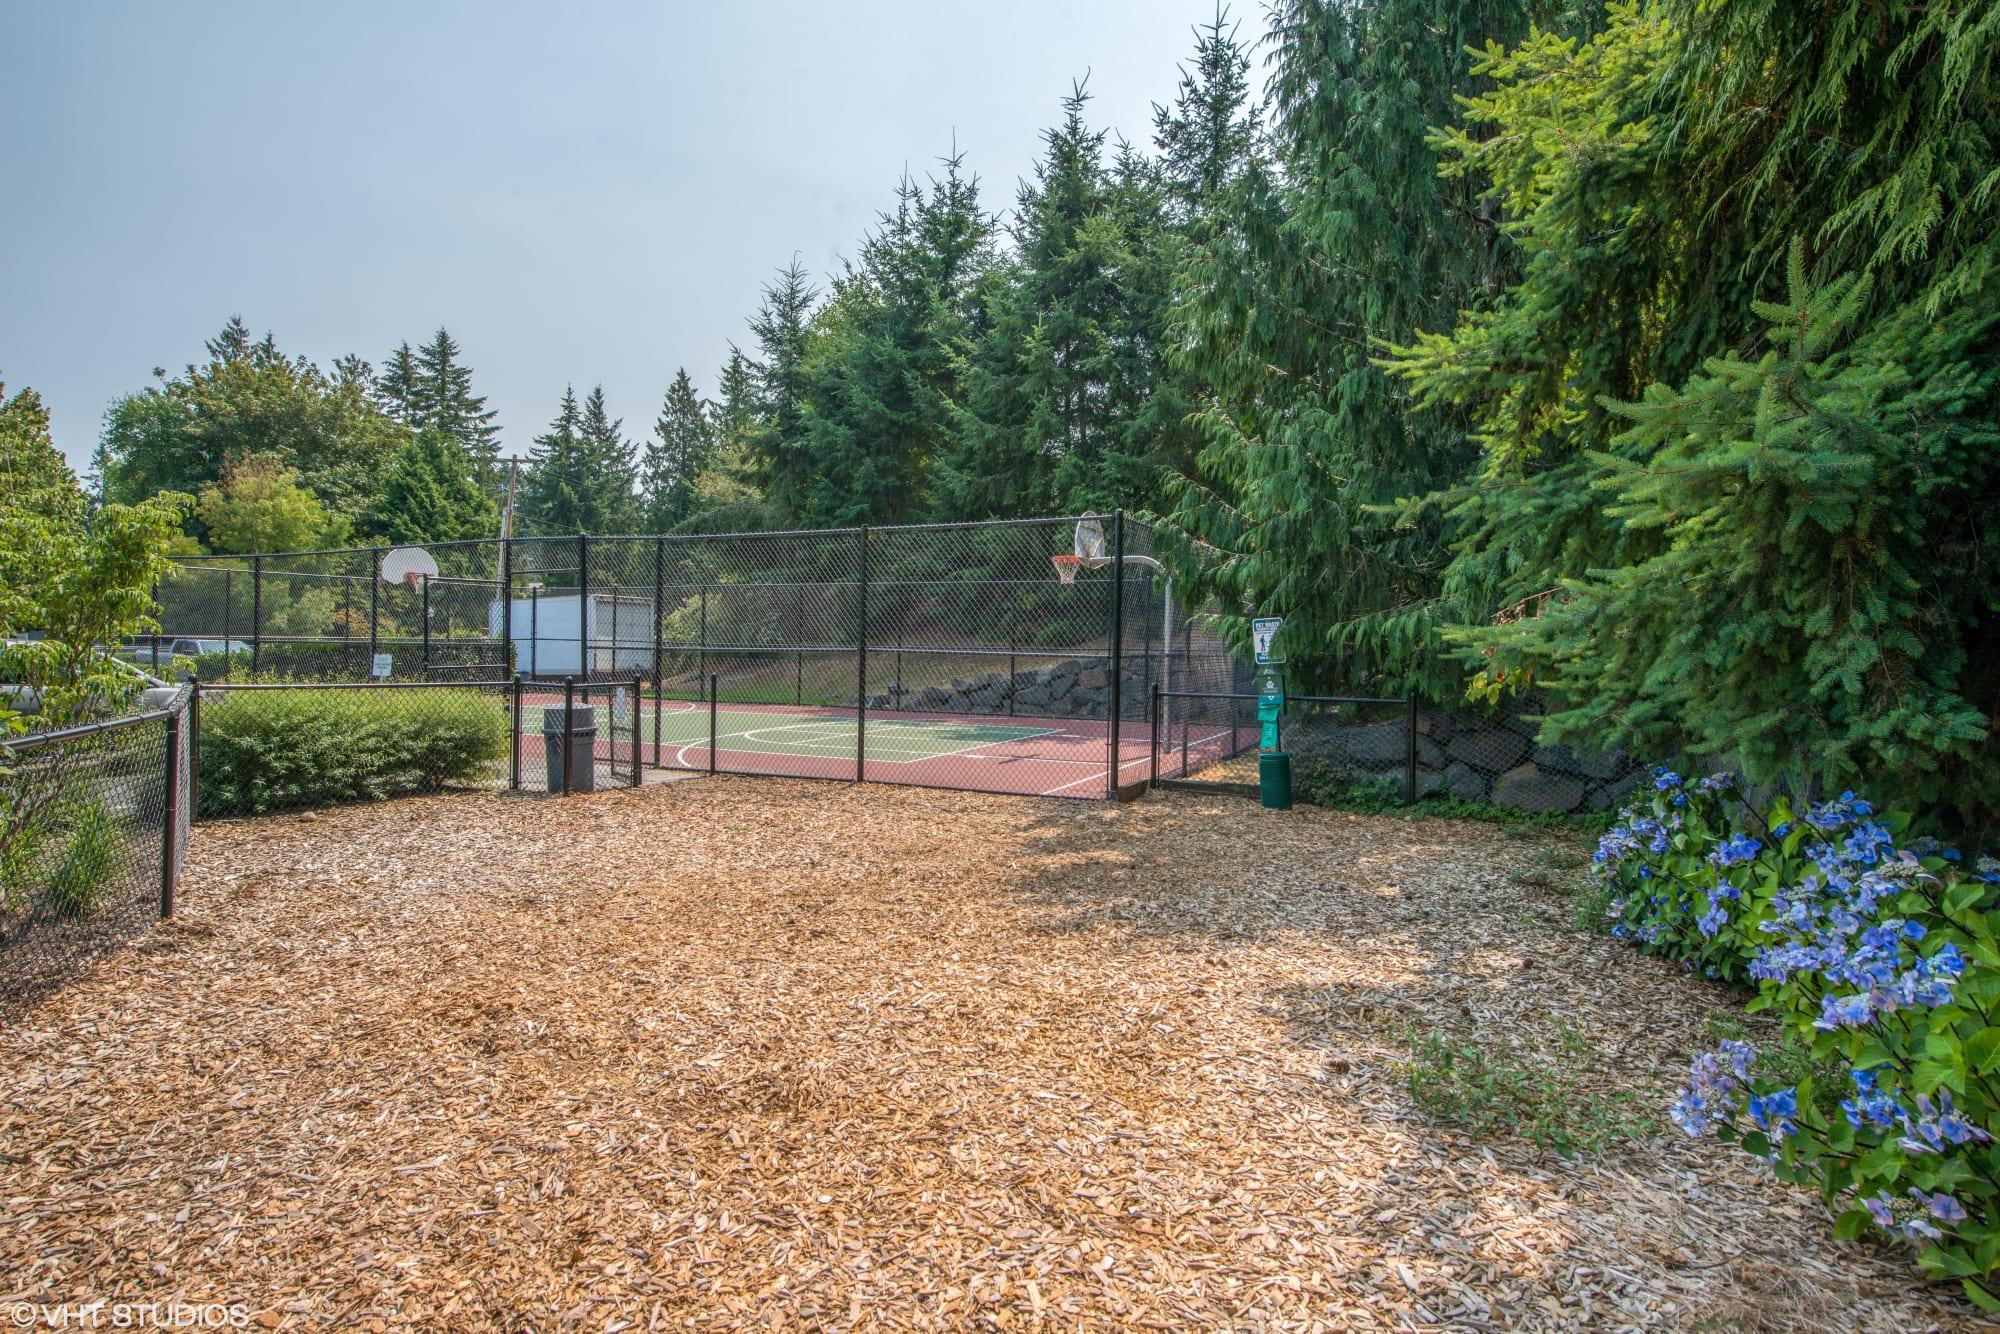 An onsite dog park at Brookside Village in Auburn, Washington